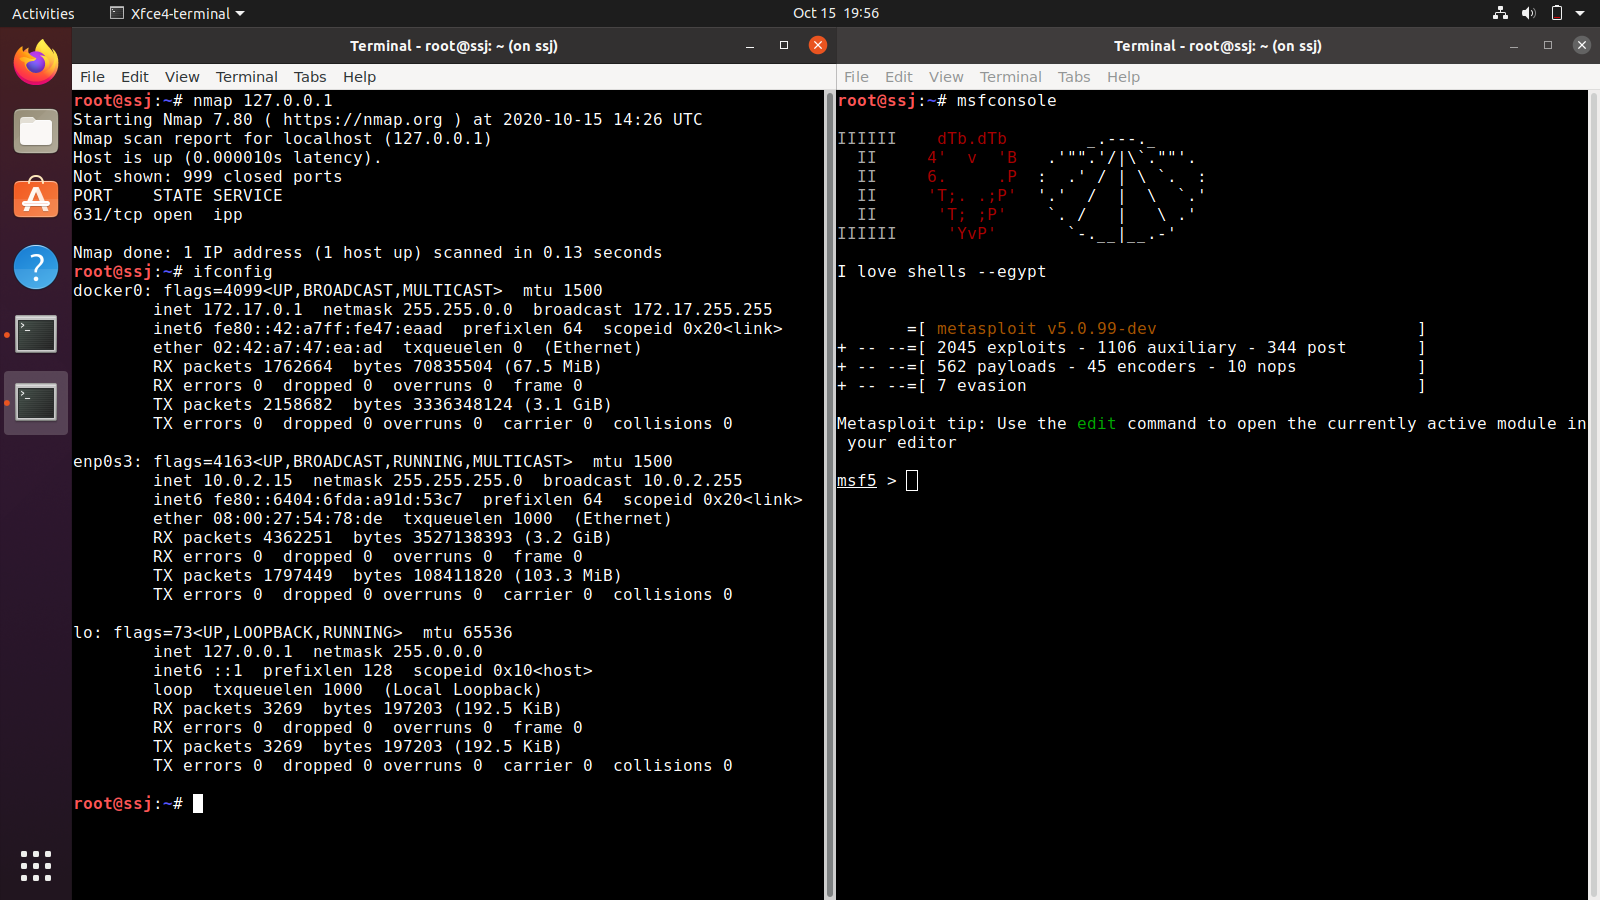 ssj ss msf nmap - SSJ: The Linux distribution that surpassed the power of Super Saiyan